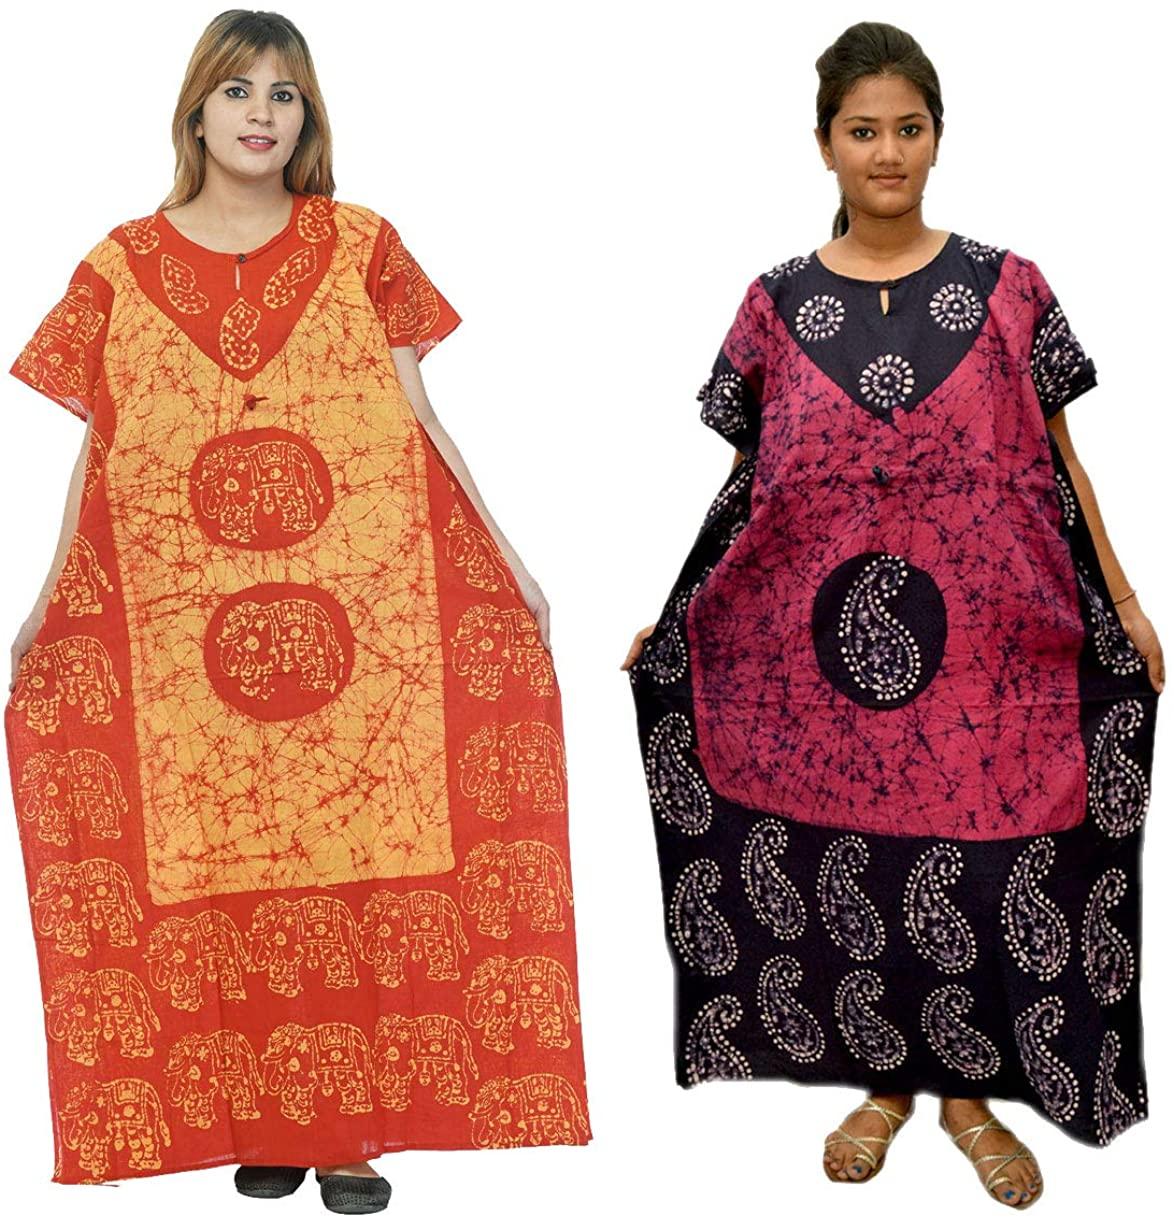 Odishabazaar Cotton Caftan/Kaftan Combo 2 Indian Cotton Batik Bohemian Long Dress